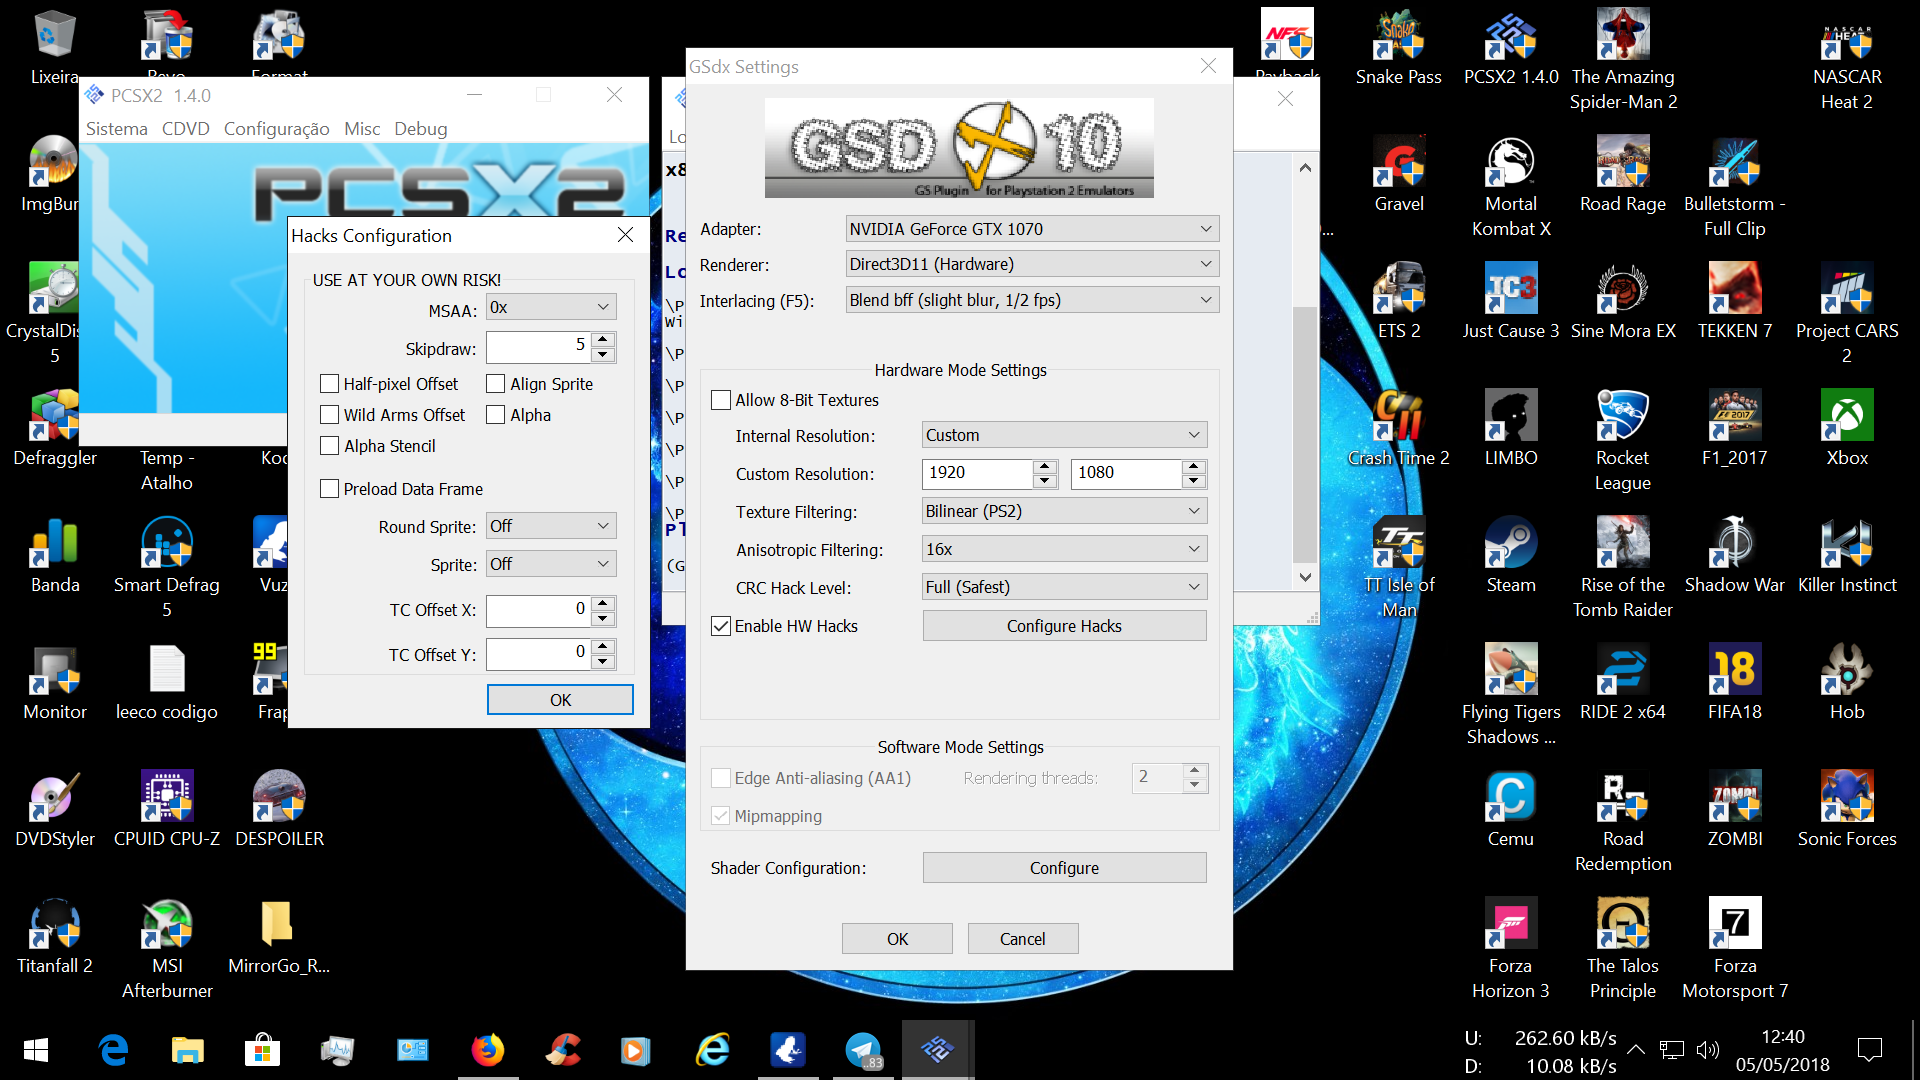 PCSX2 - Emulador de Playstation 2 - [ TÓPICO DEDICADO